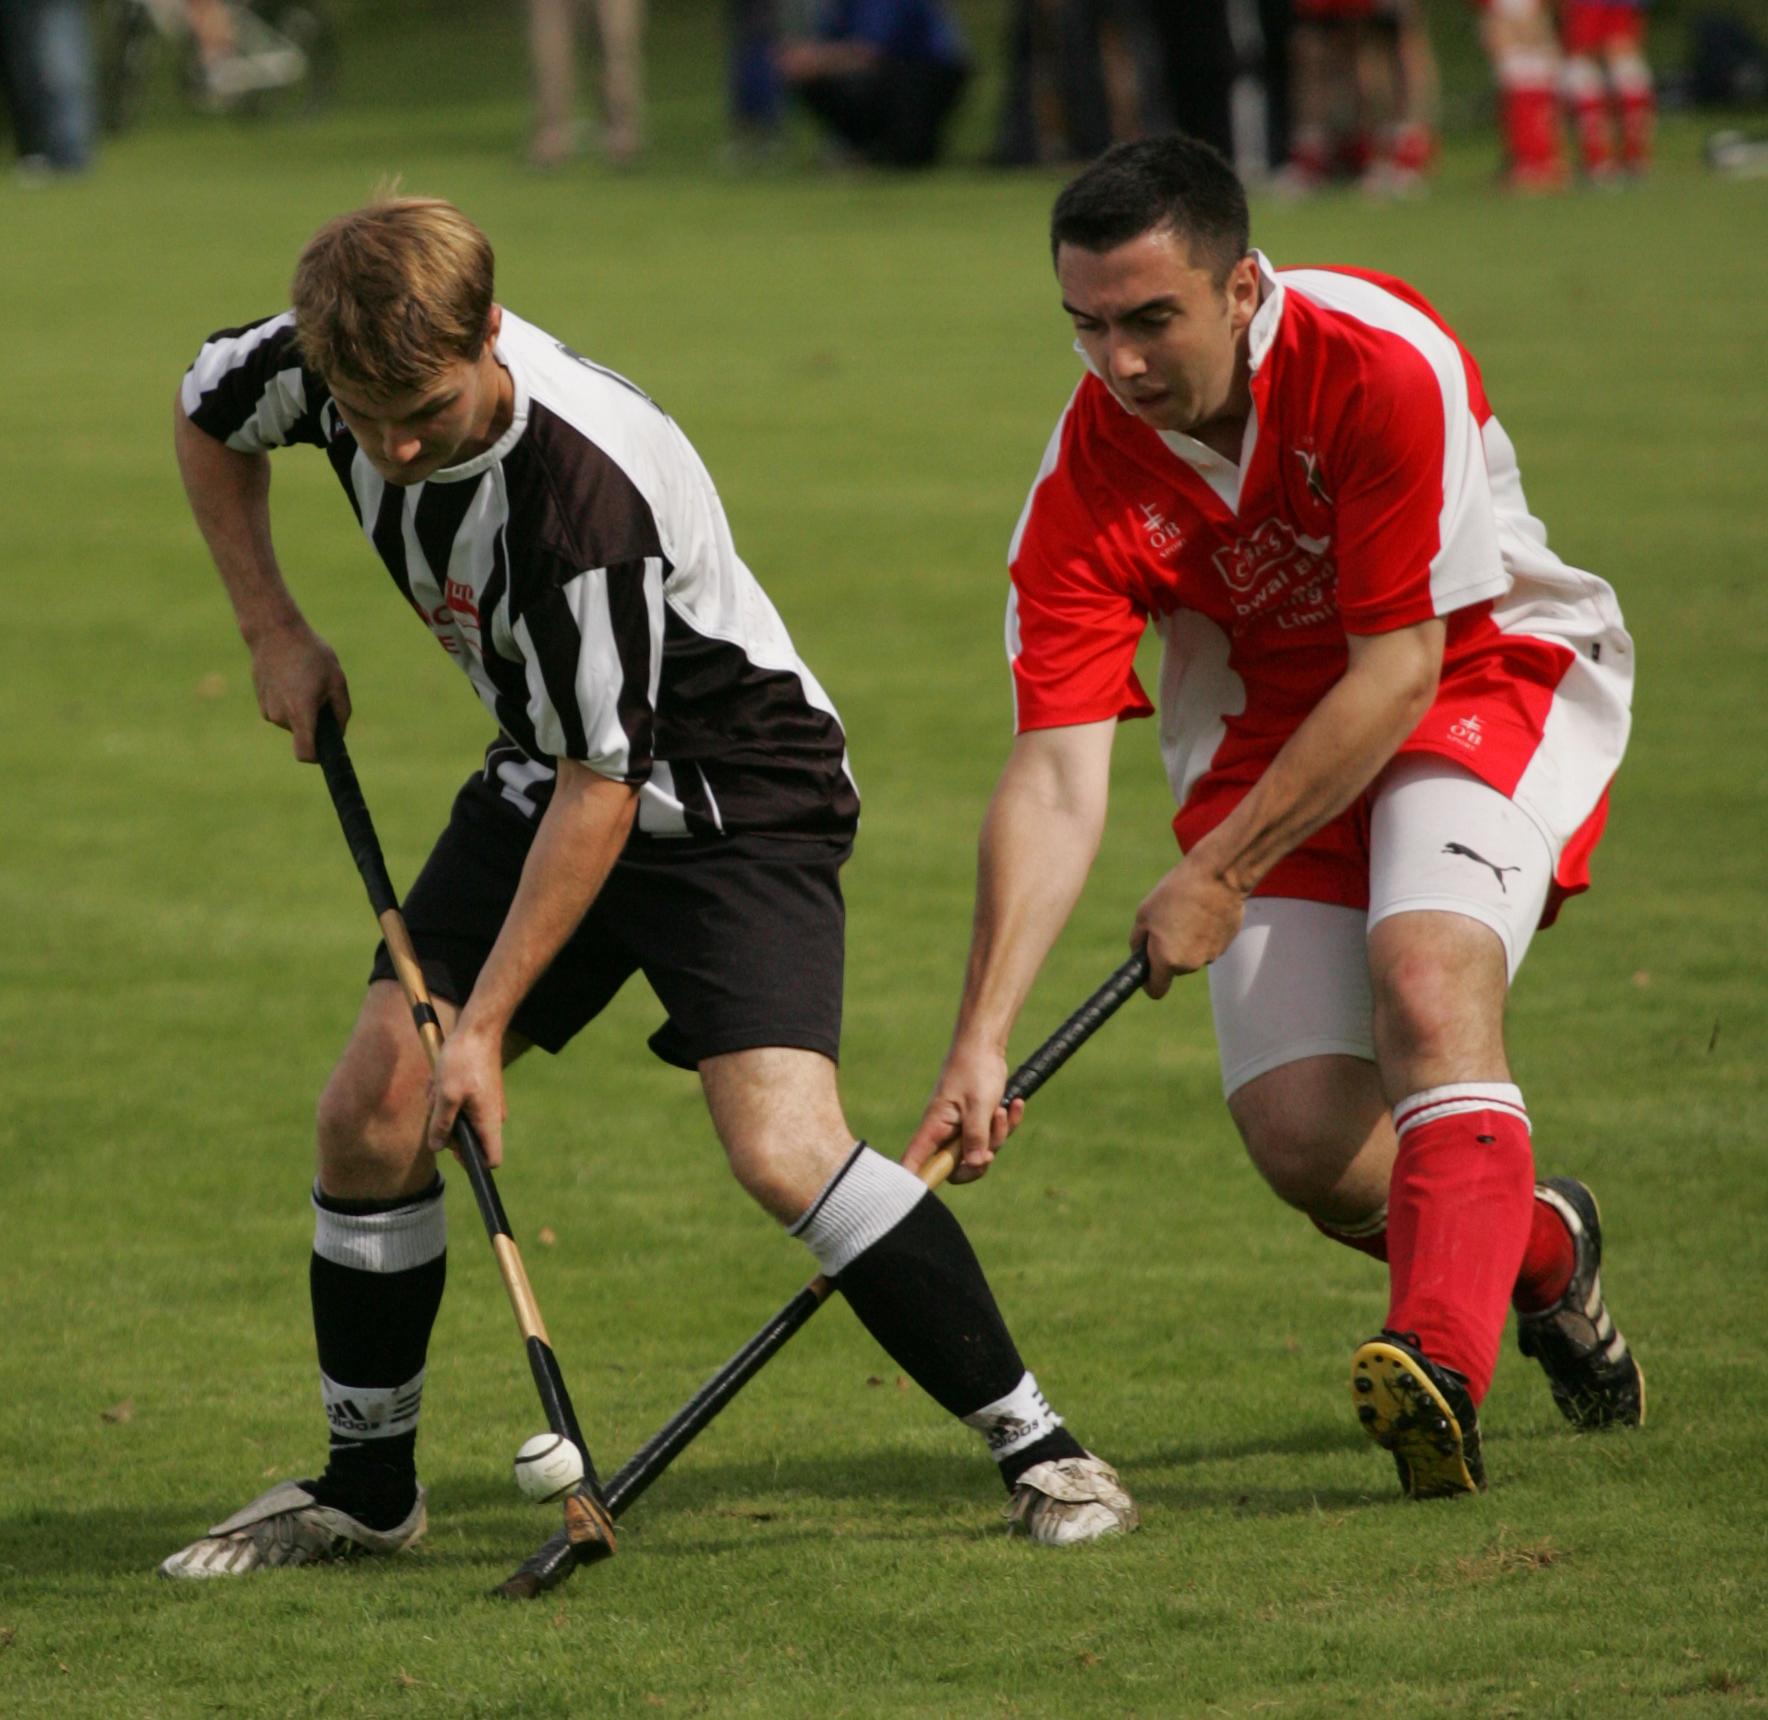 Schottische Sportarten